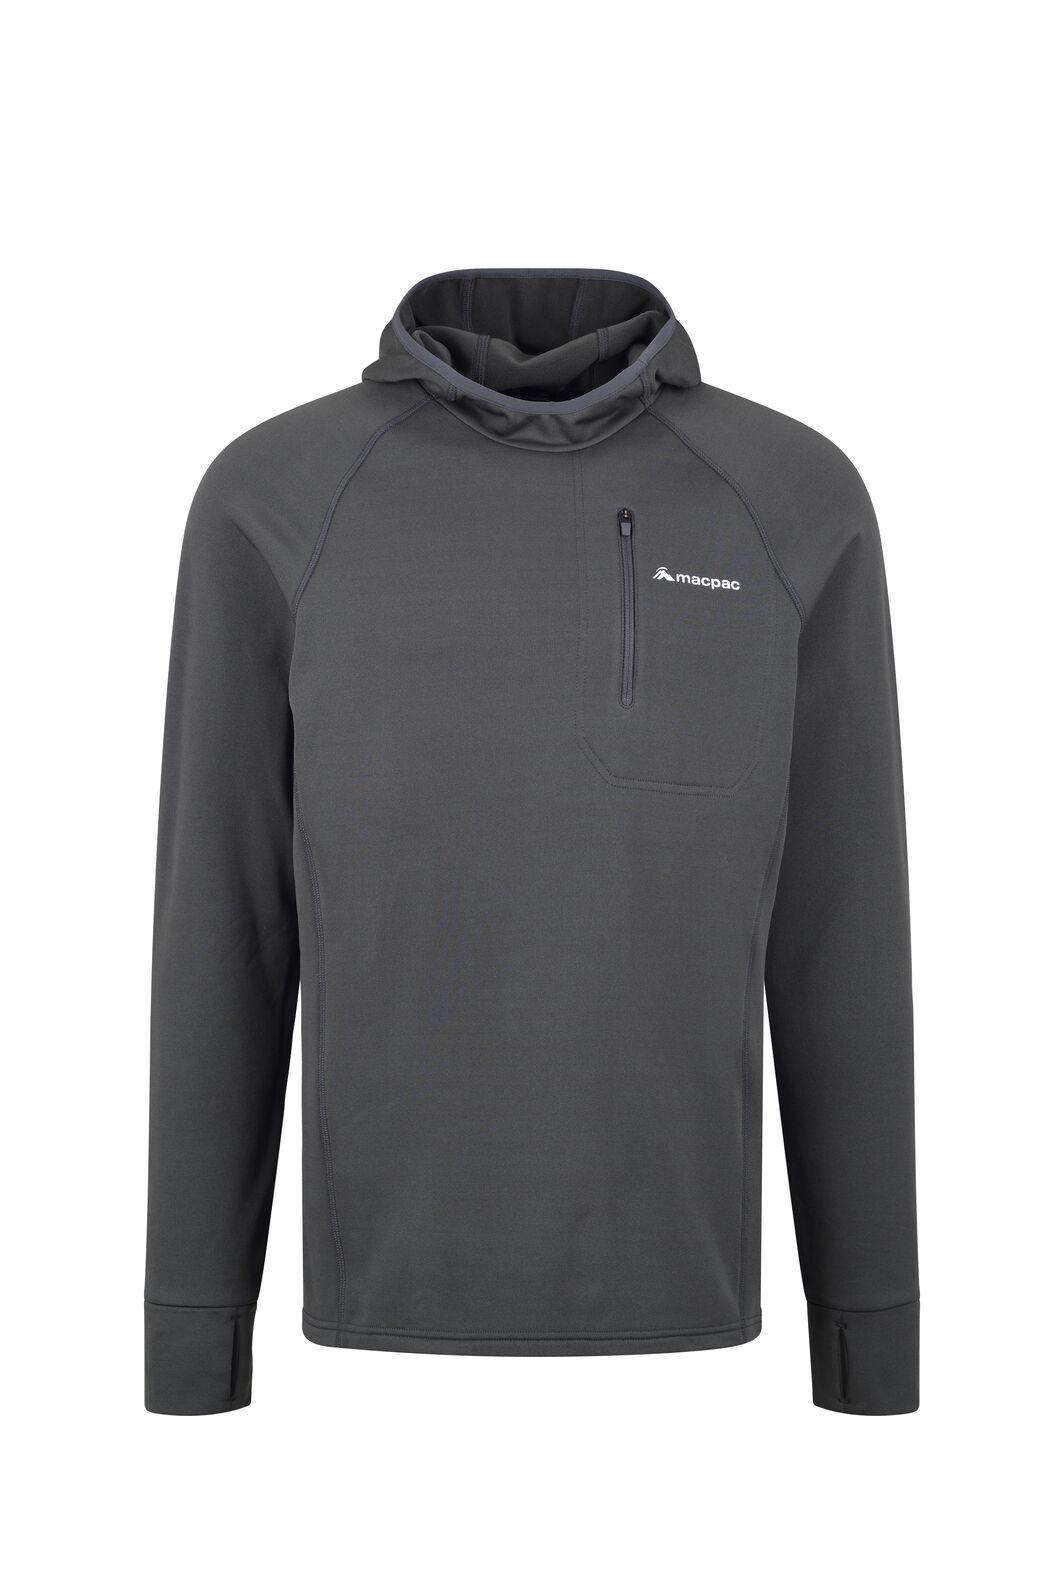 Macpac Traction Pontetorto® Pullover Hoody - Men's, Asphalt, hi-res